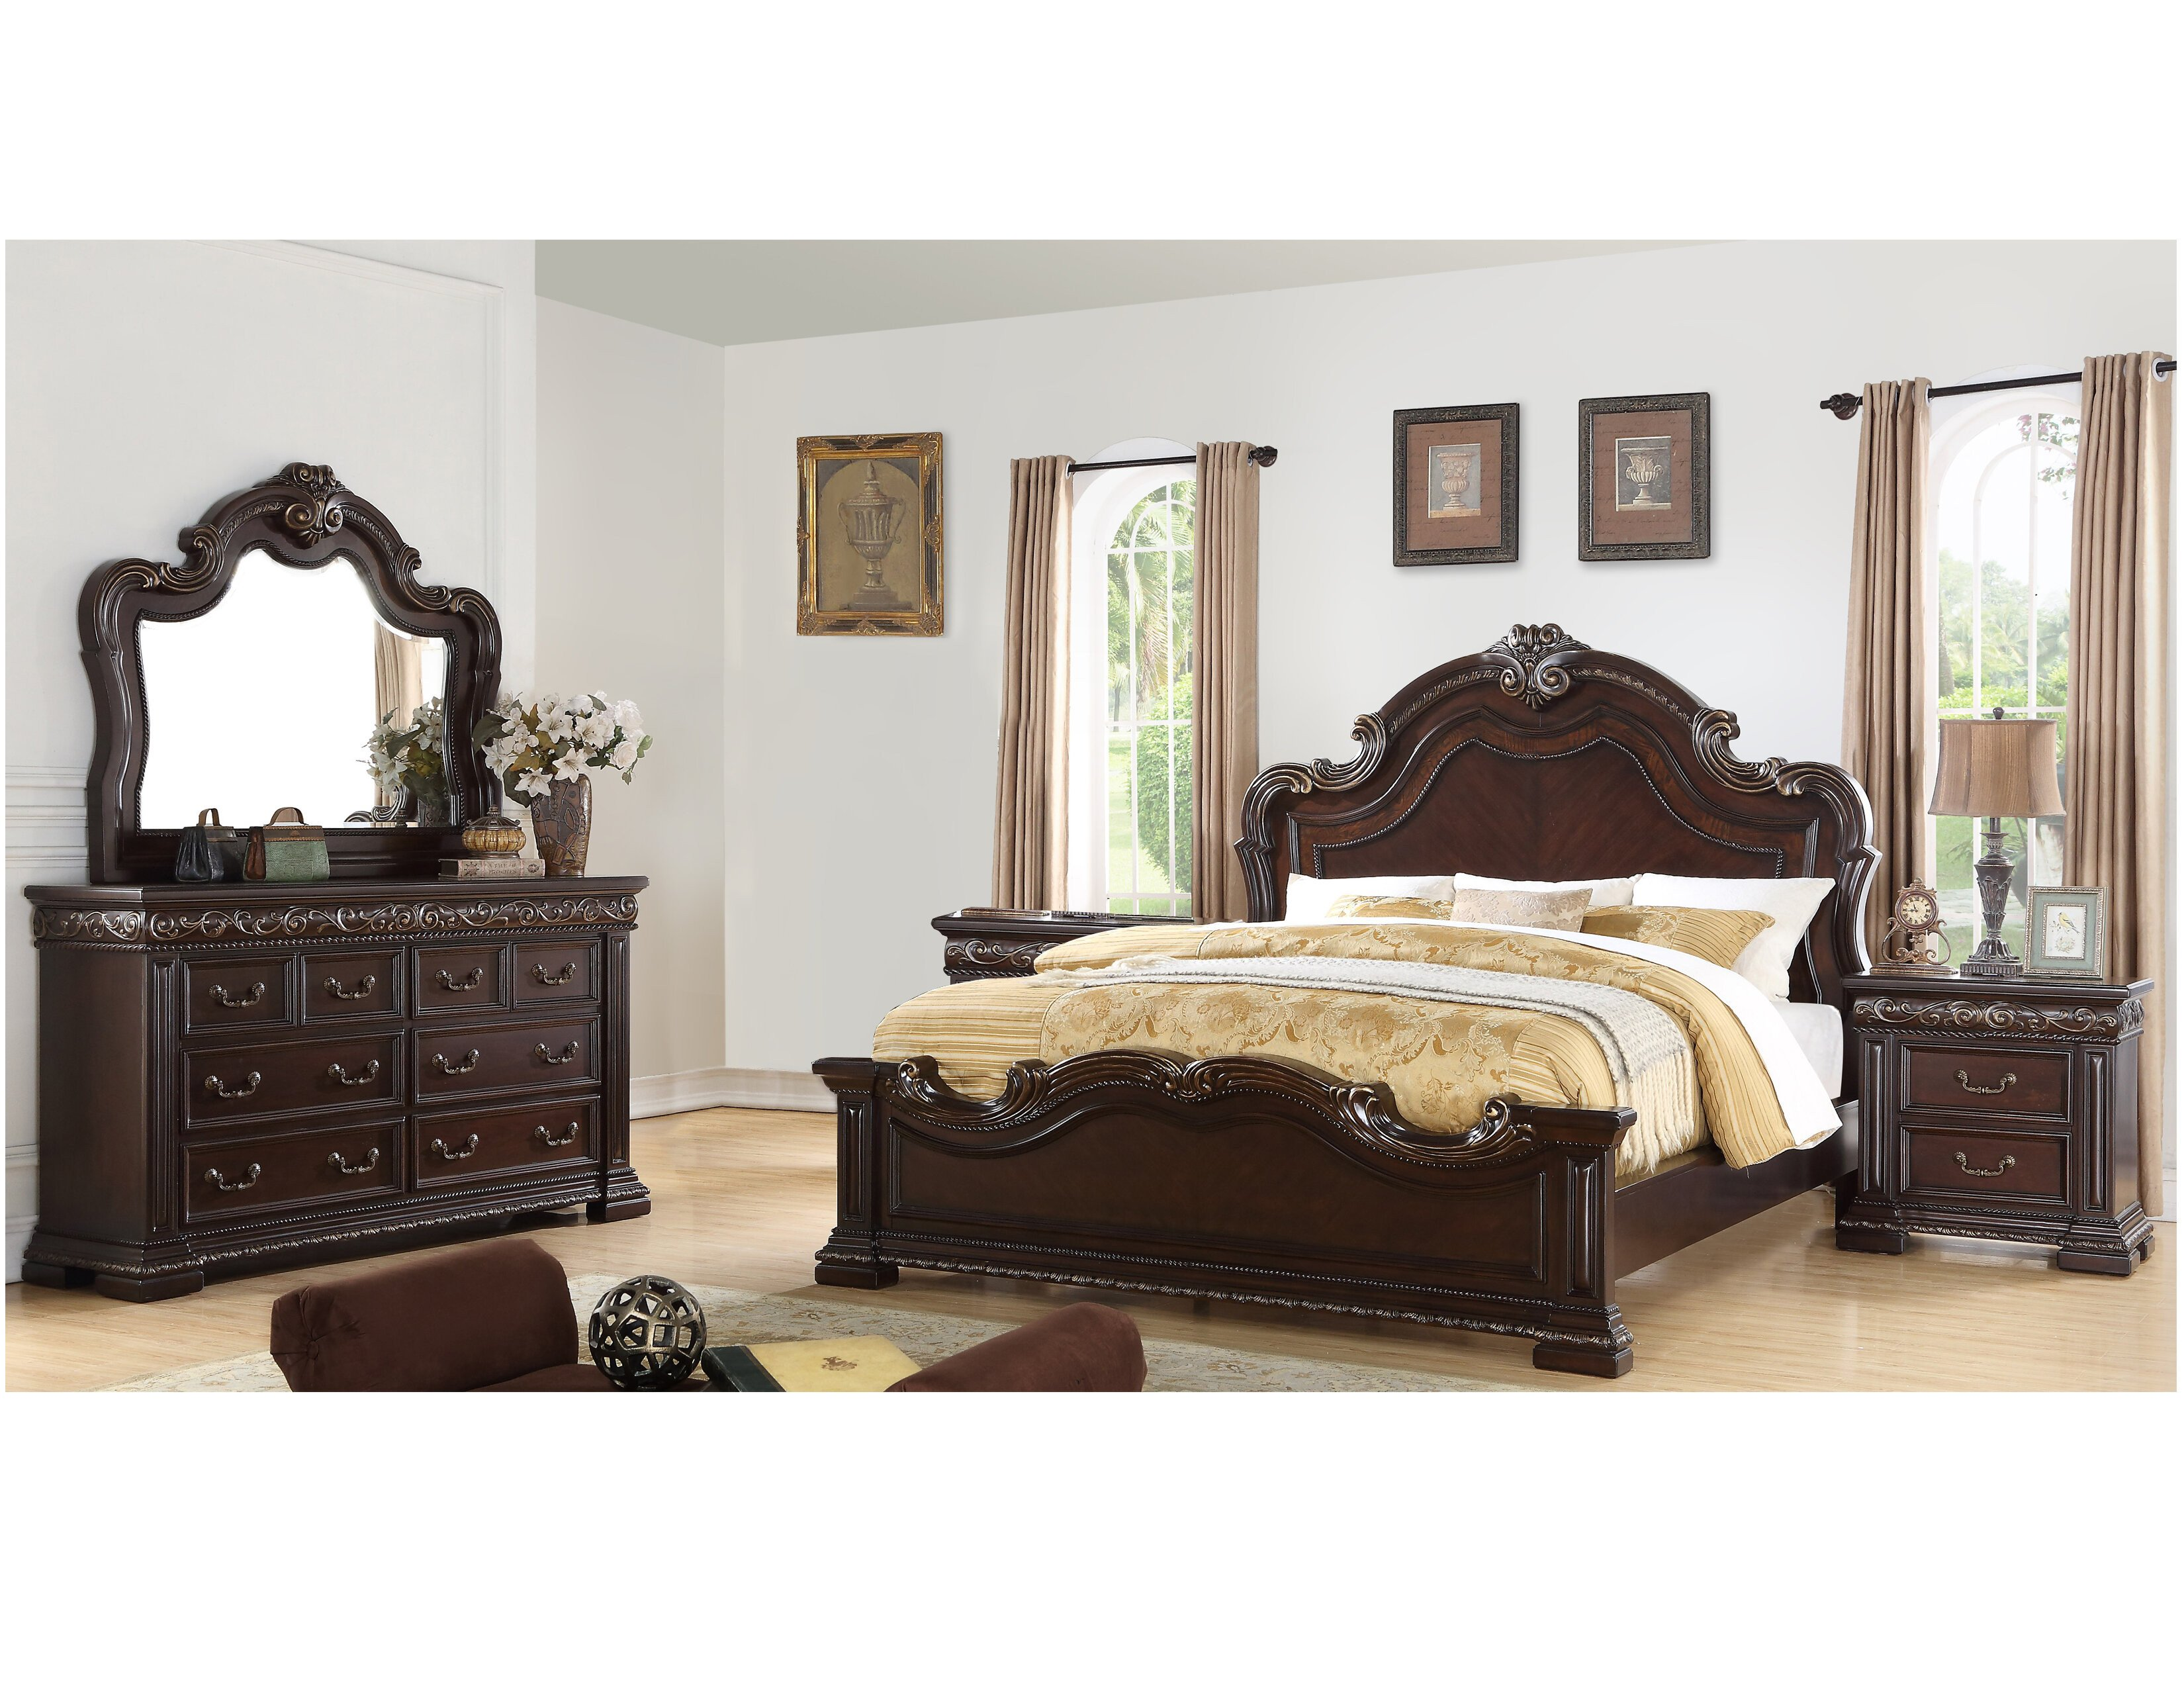 Mirrored Headboard Bedroom Set Beautiful Bannruod Standard solid Wood 5 Piece Bedroom Set